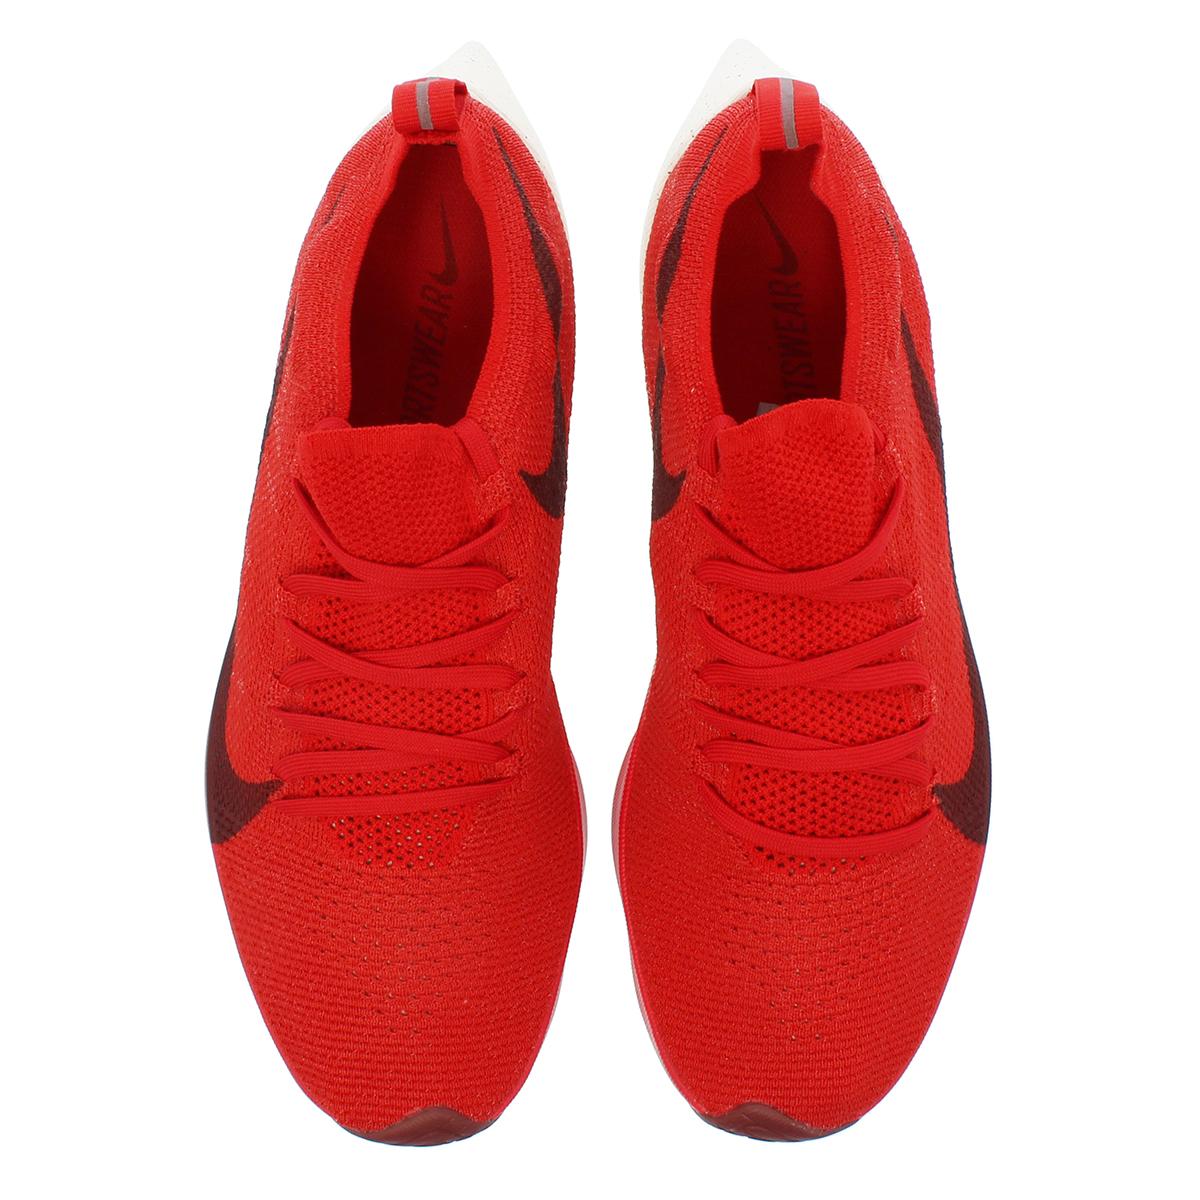 NIKE VAPOR STREET FLYKNIT Nike vapor street fried food knit UNIVERSITY RED DARK  TEAM RED SAIL BLACK 1c264b356